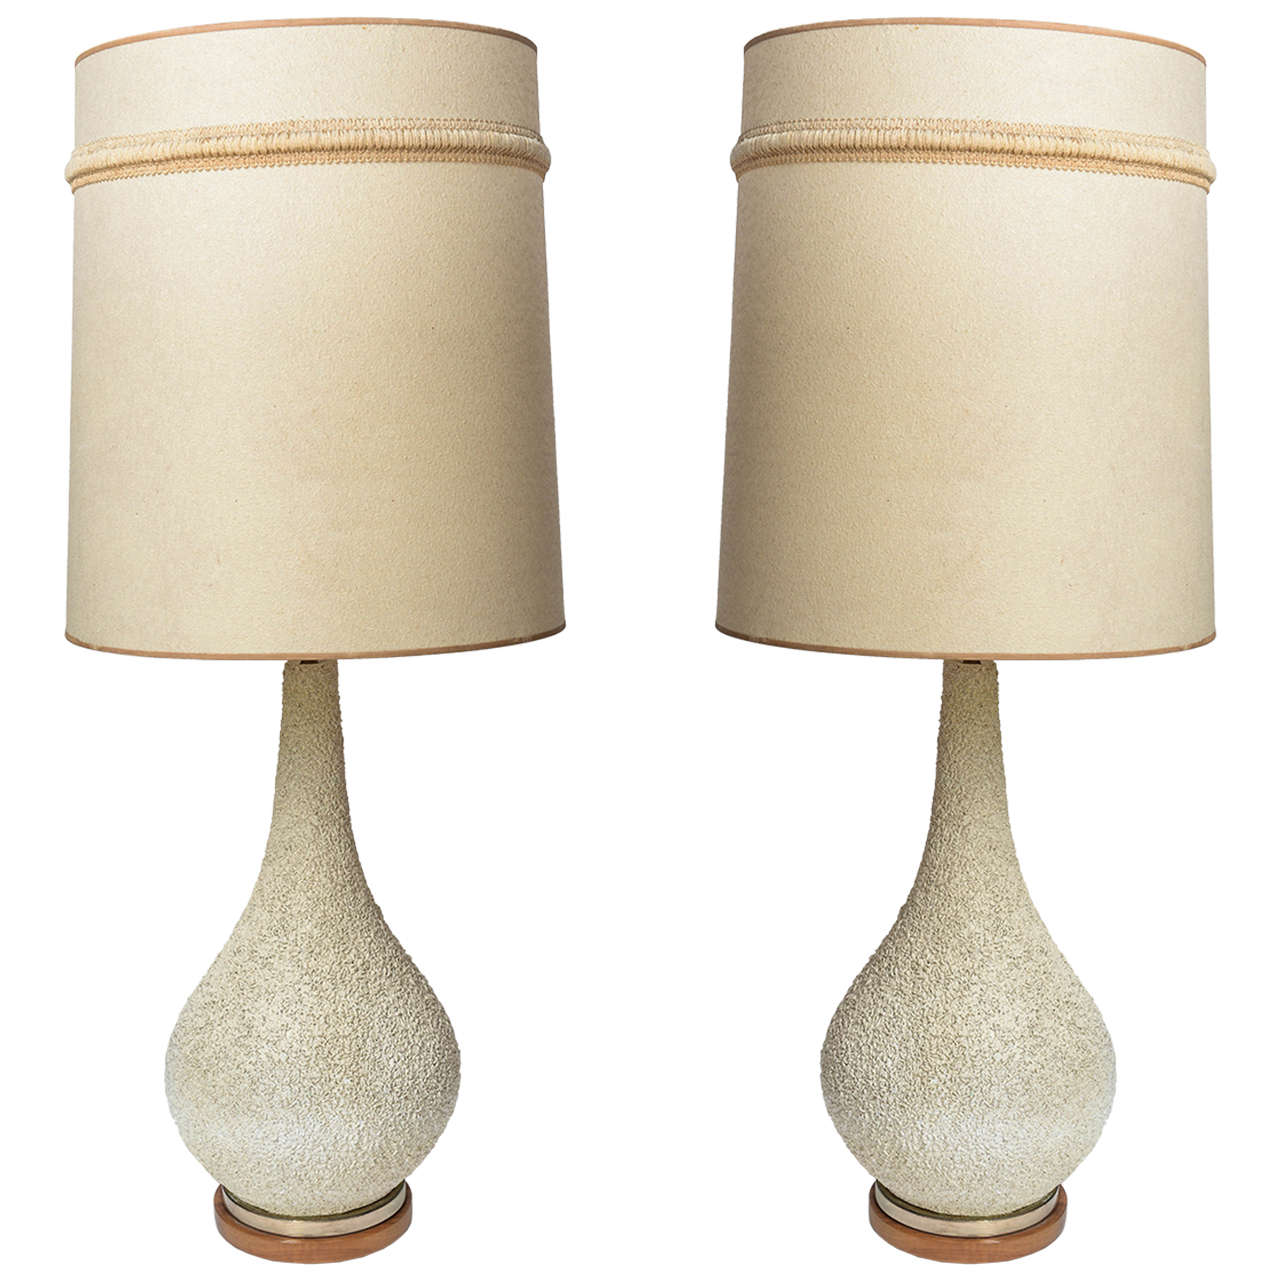 Ceramic Modern Lamps reversadermcreamcom : X from reversadermcream.com size 1280 x 1280 jpeg 120kB